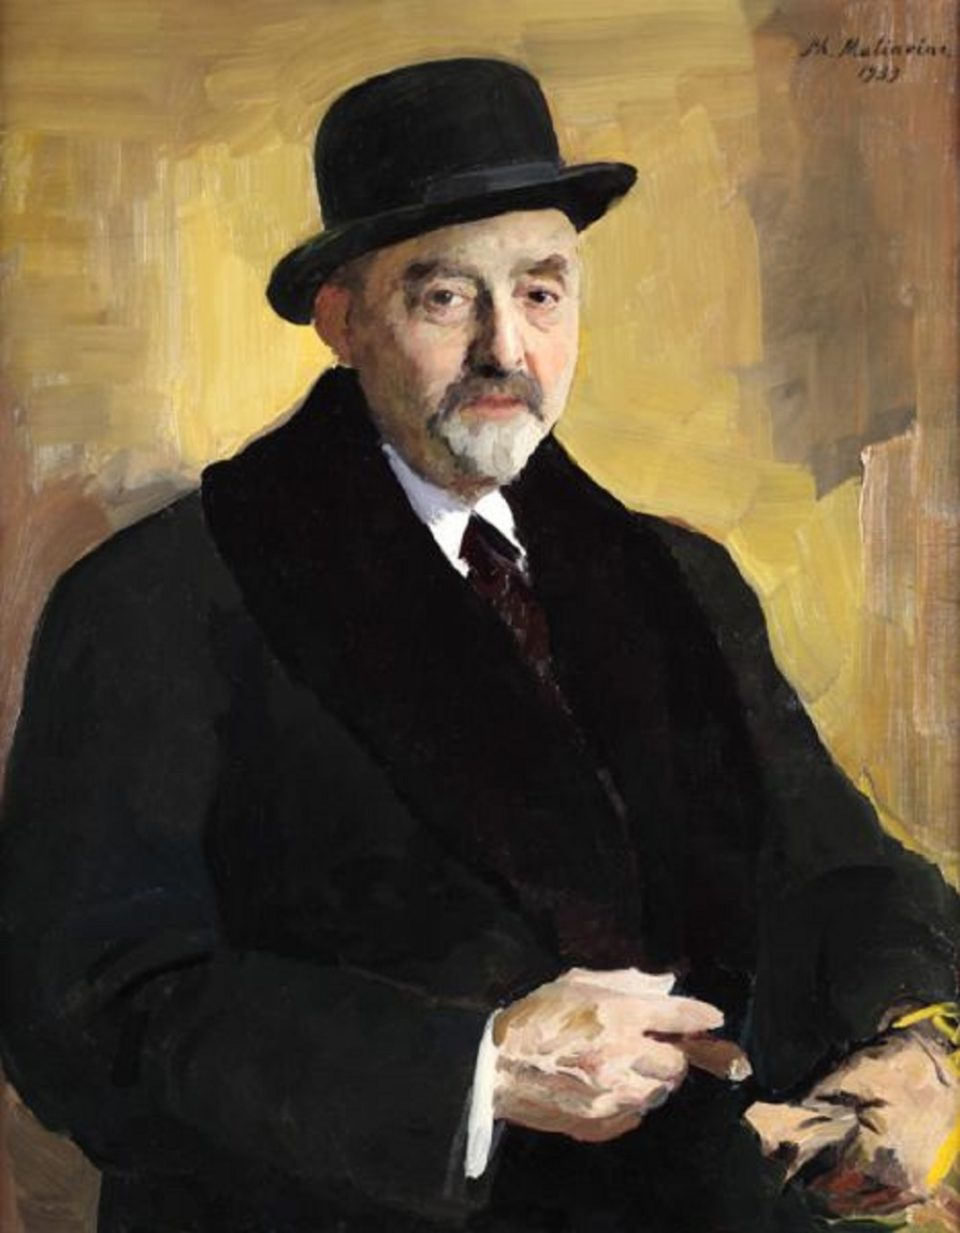 Ris.2-Portret-V.-Levi-kisti-M.-Malyavina-1939-g